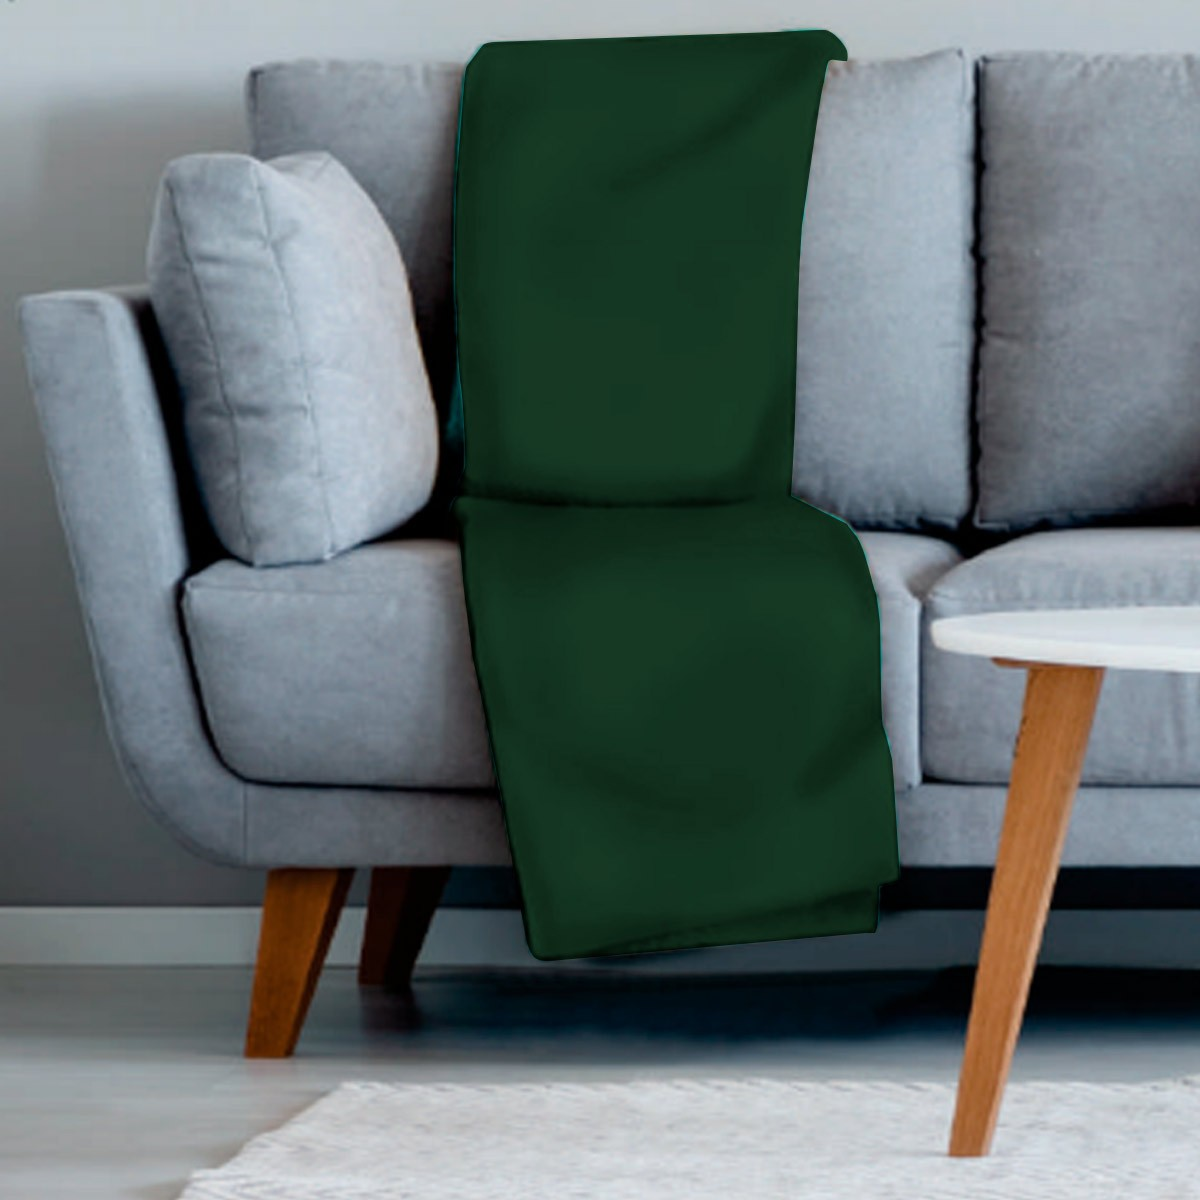 Manta sofa veludo 210x140 VERDE